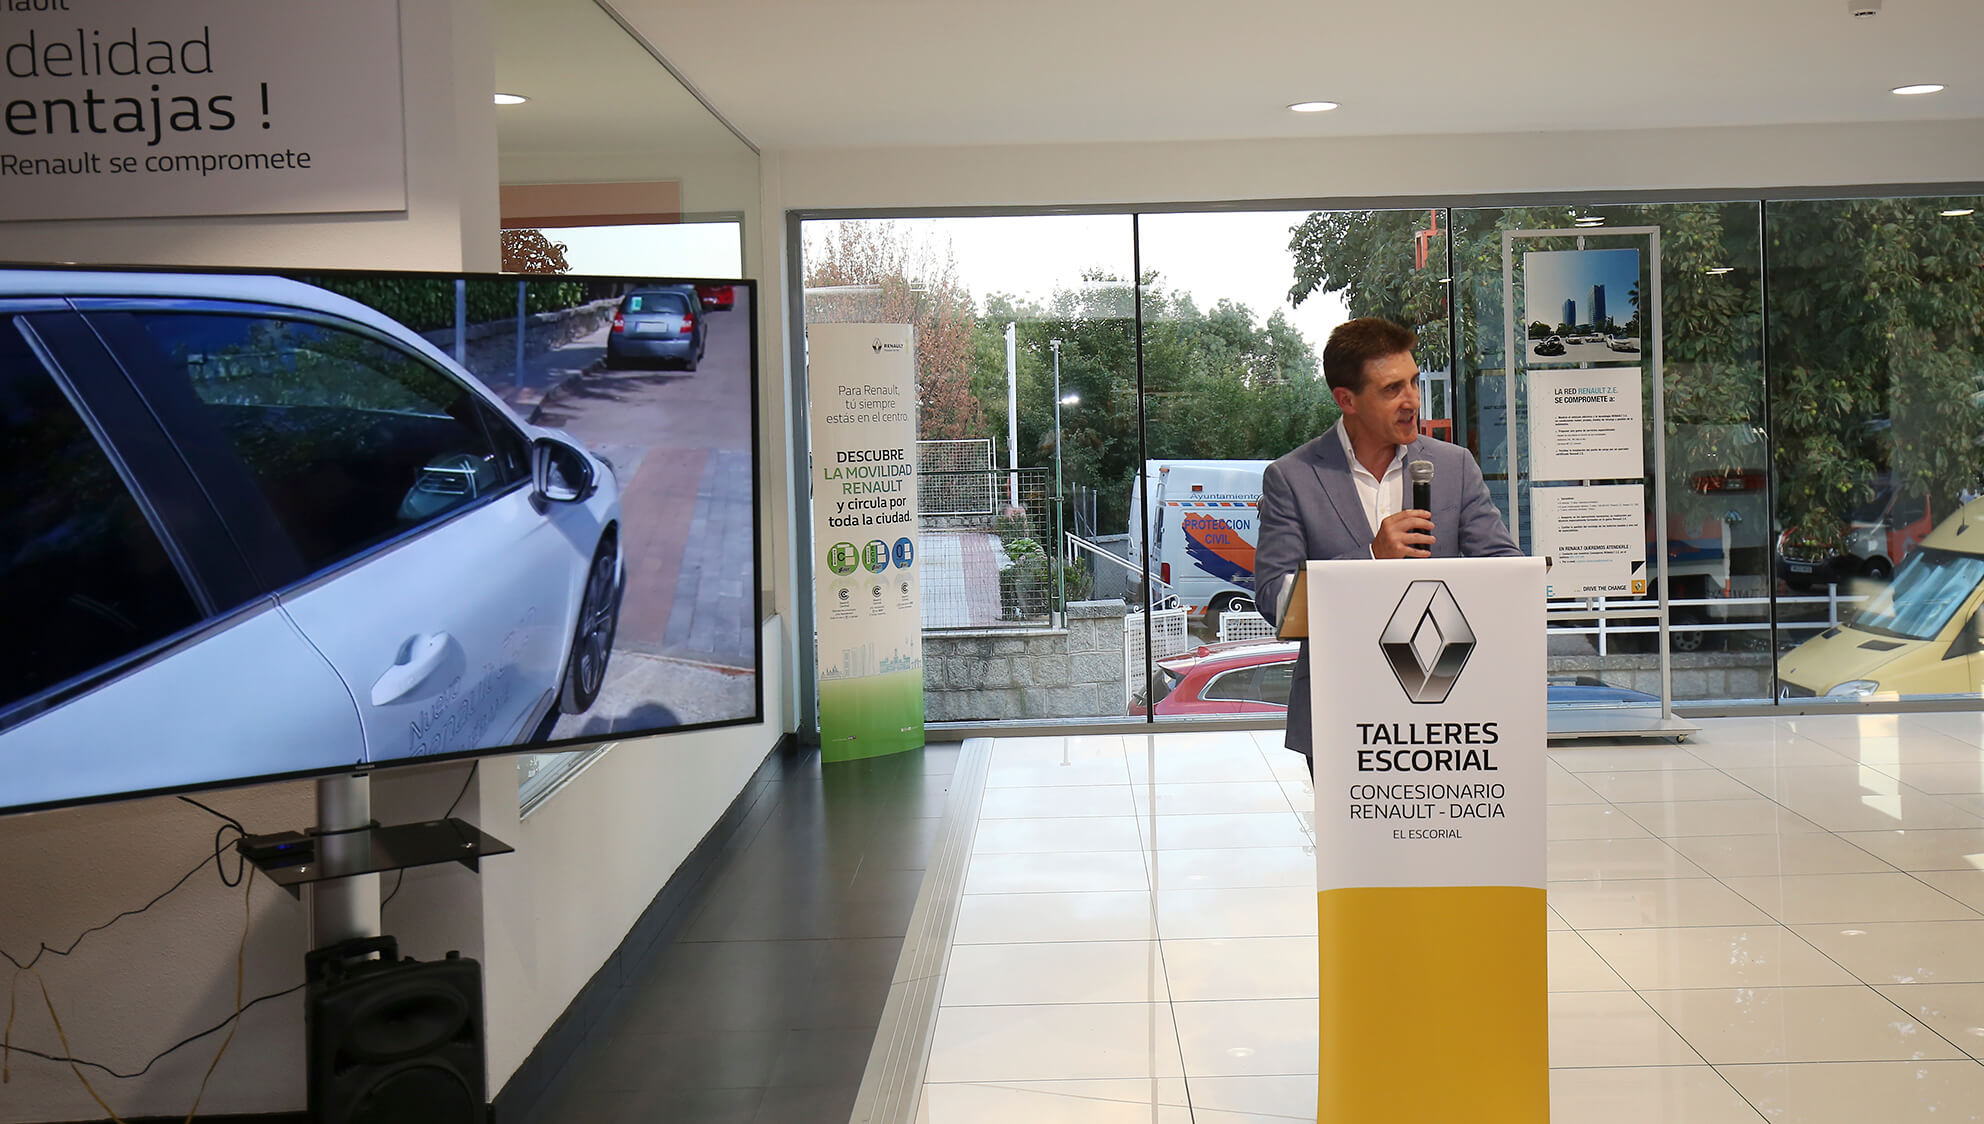 Renault Talleres Escorial